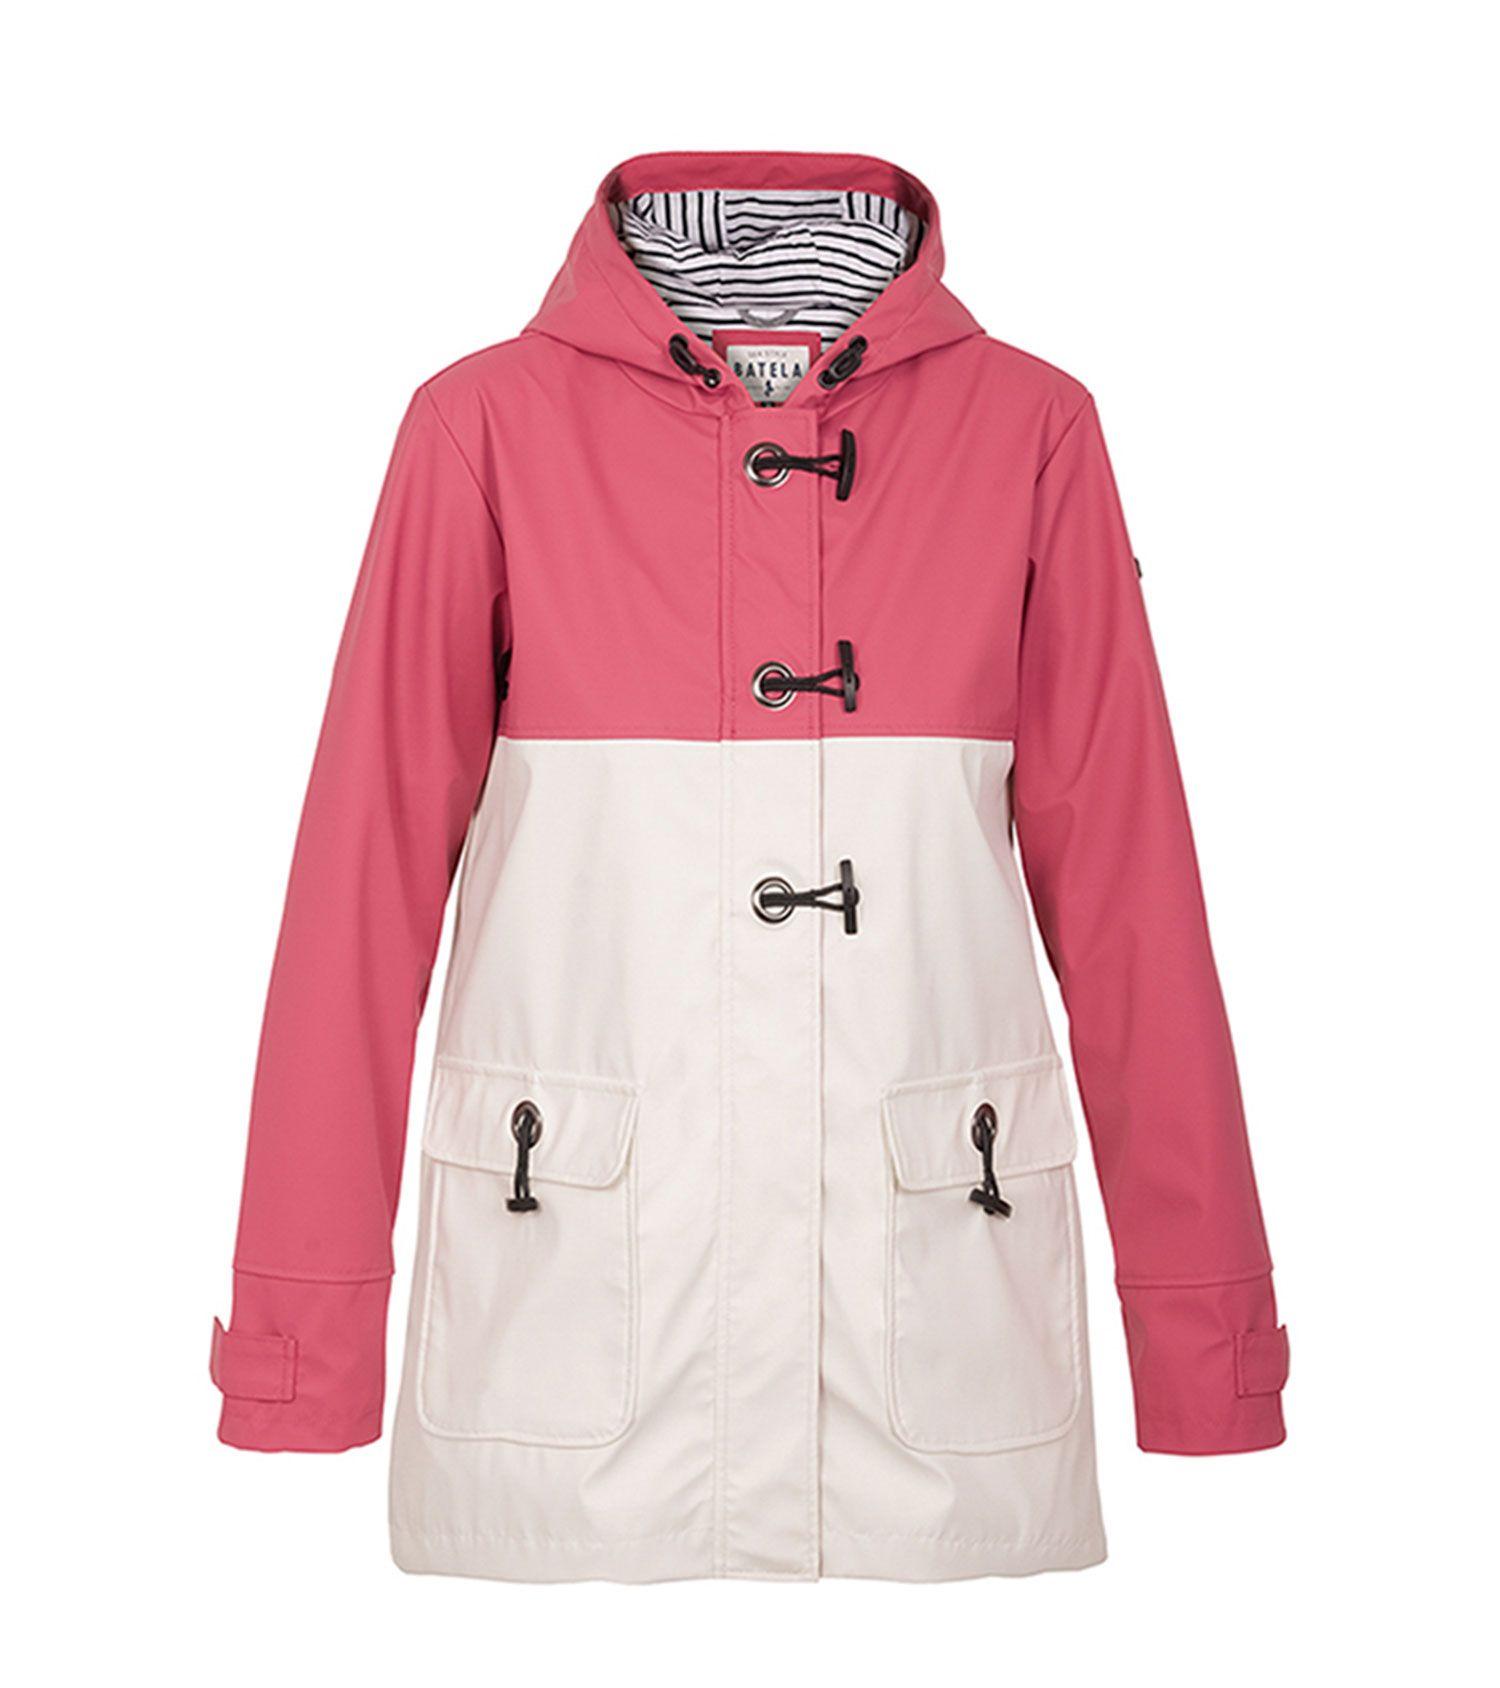 impermeable nautico mujer batela blanco y rosa antiguo 3047 1